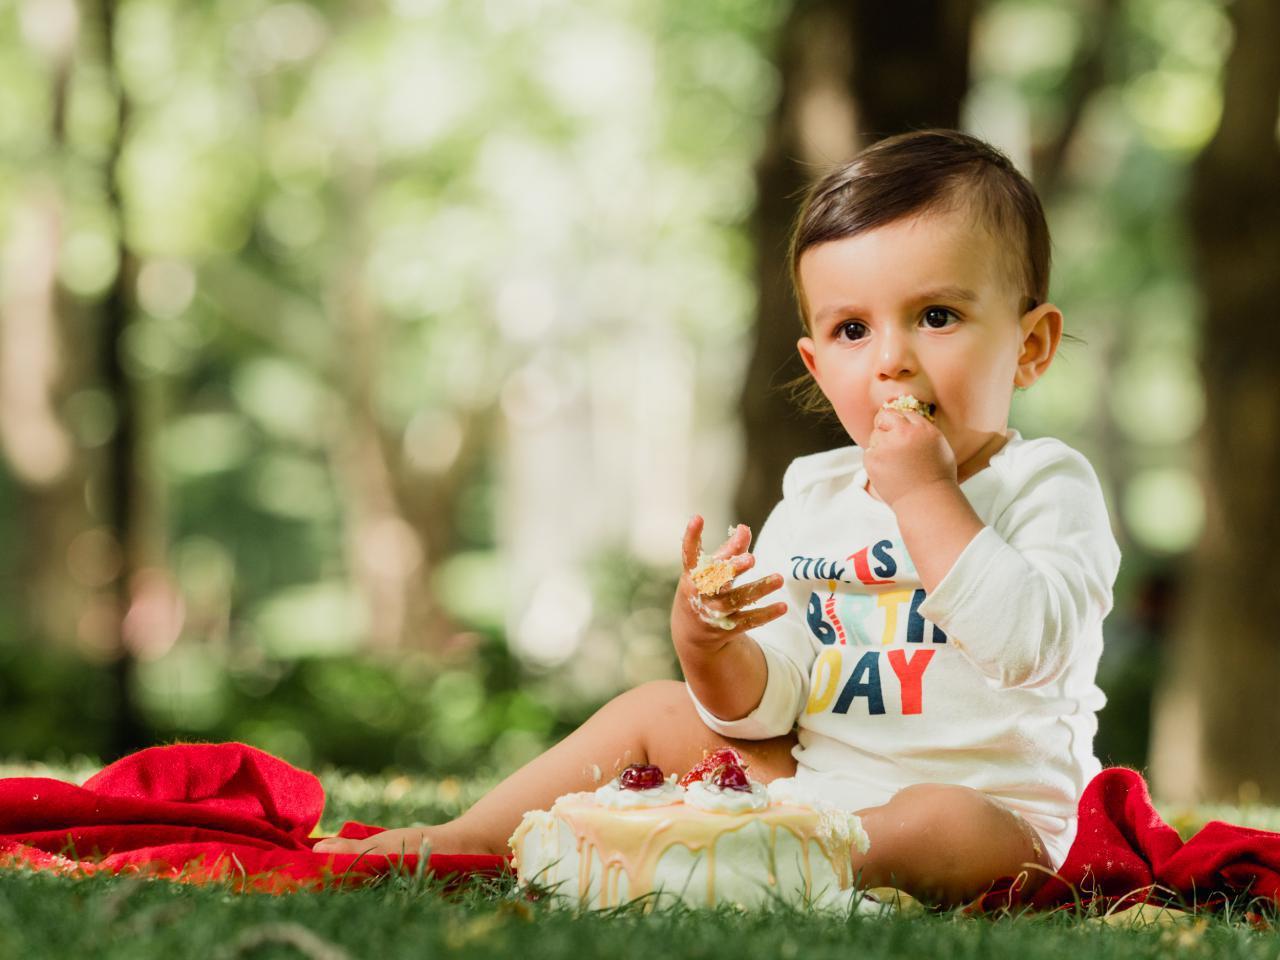 Children-Photography-5.jpg